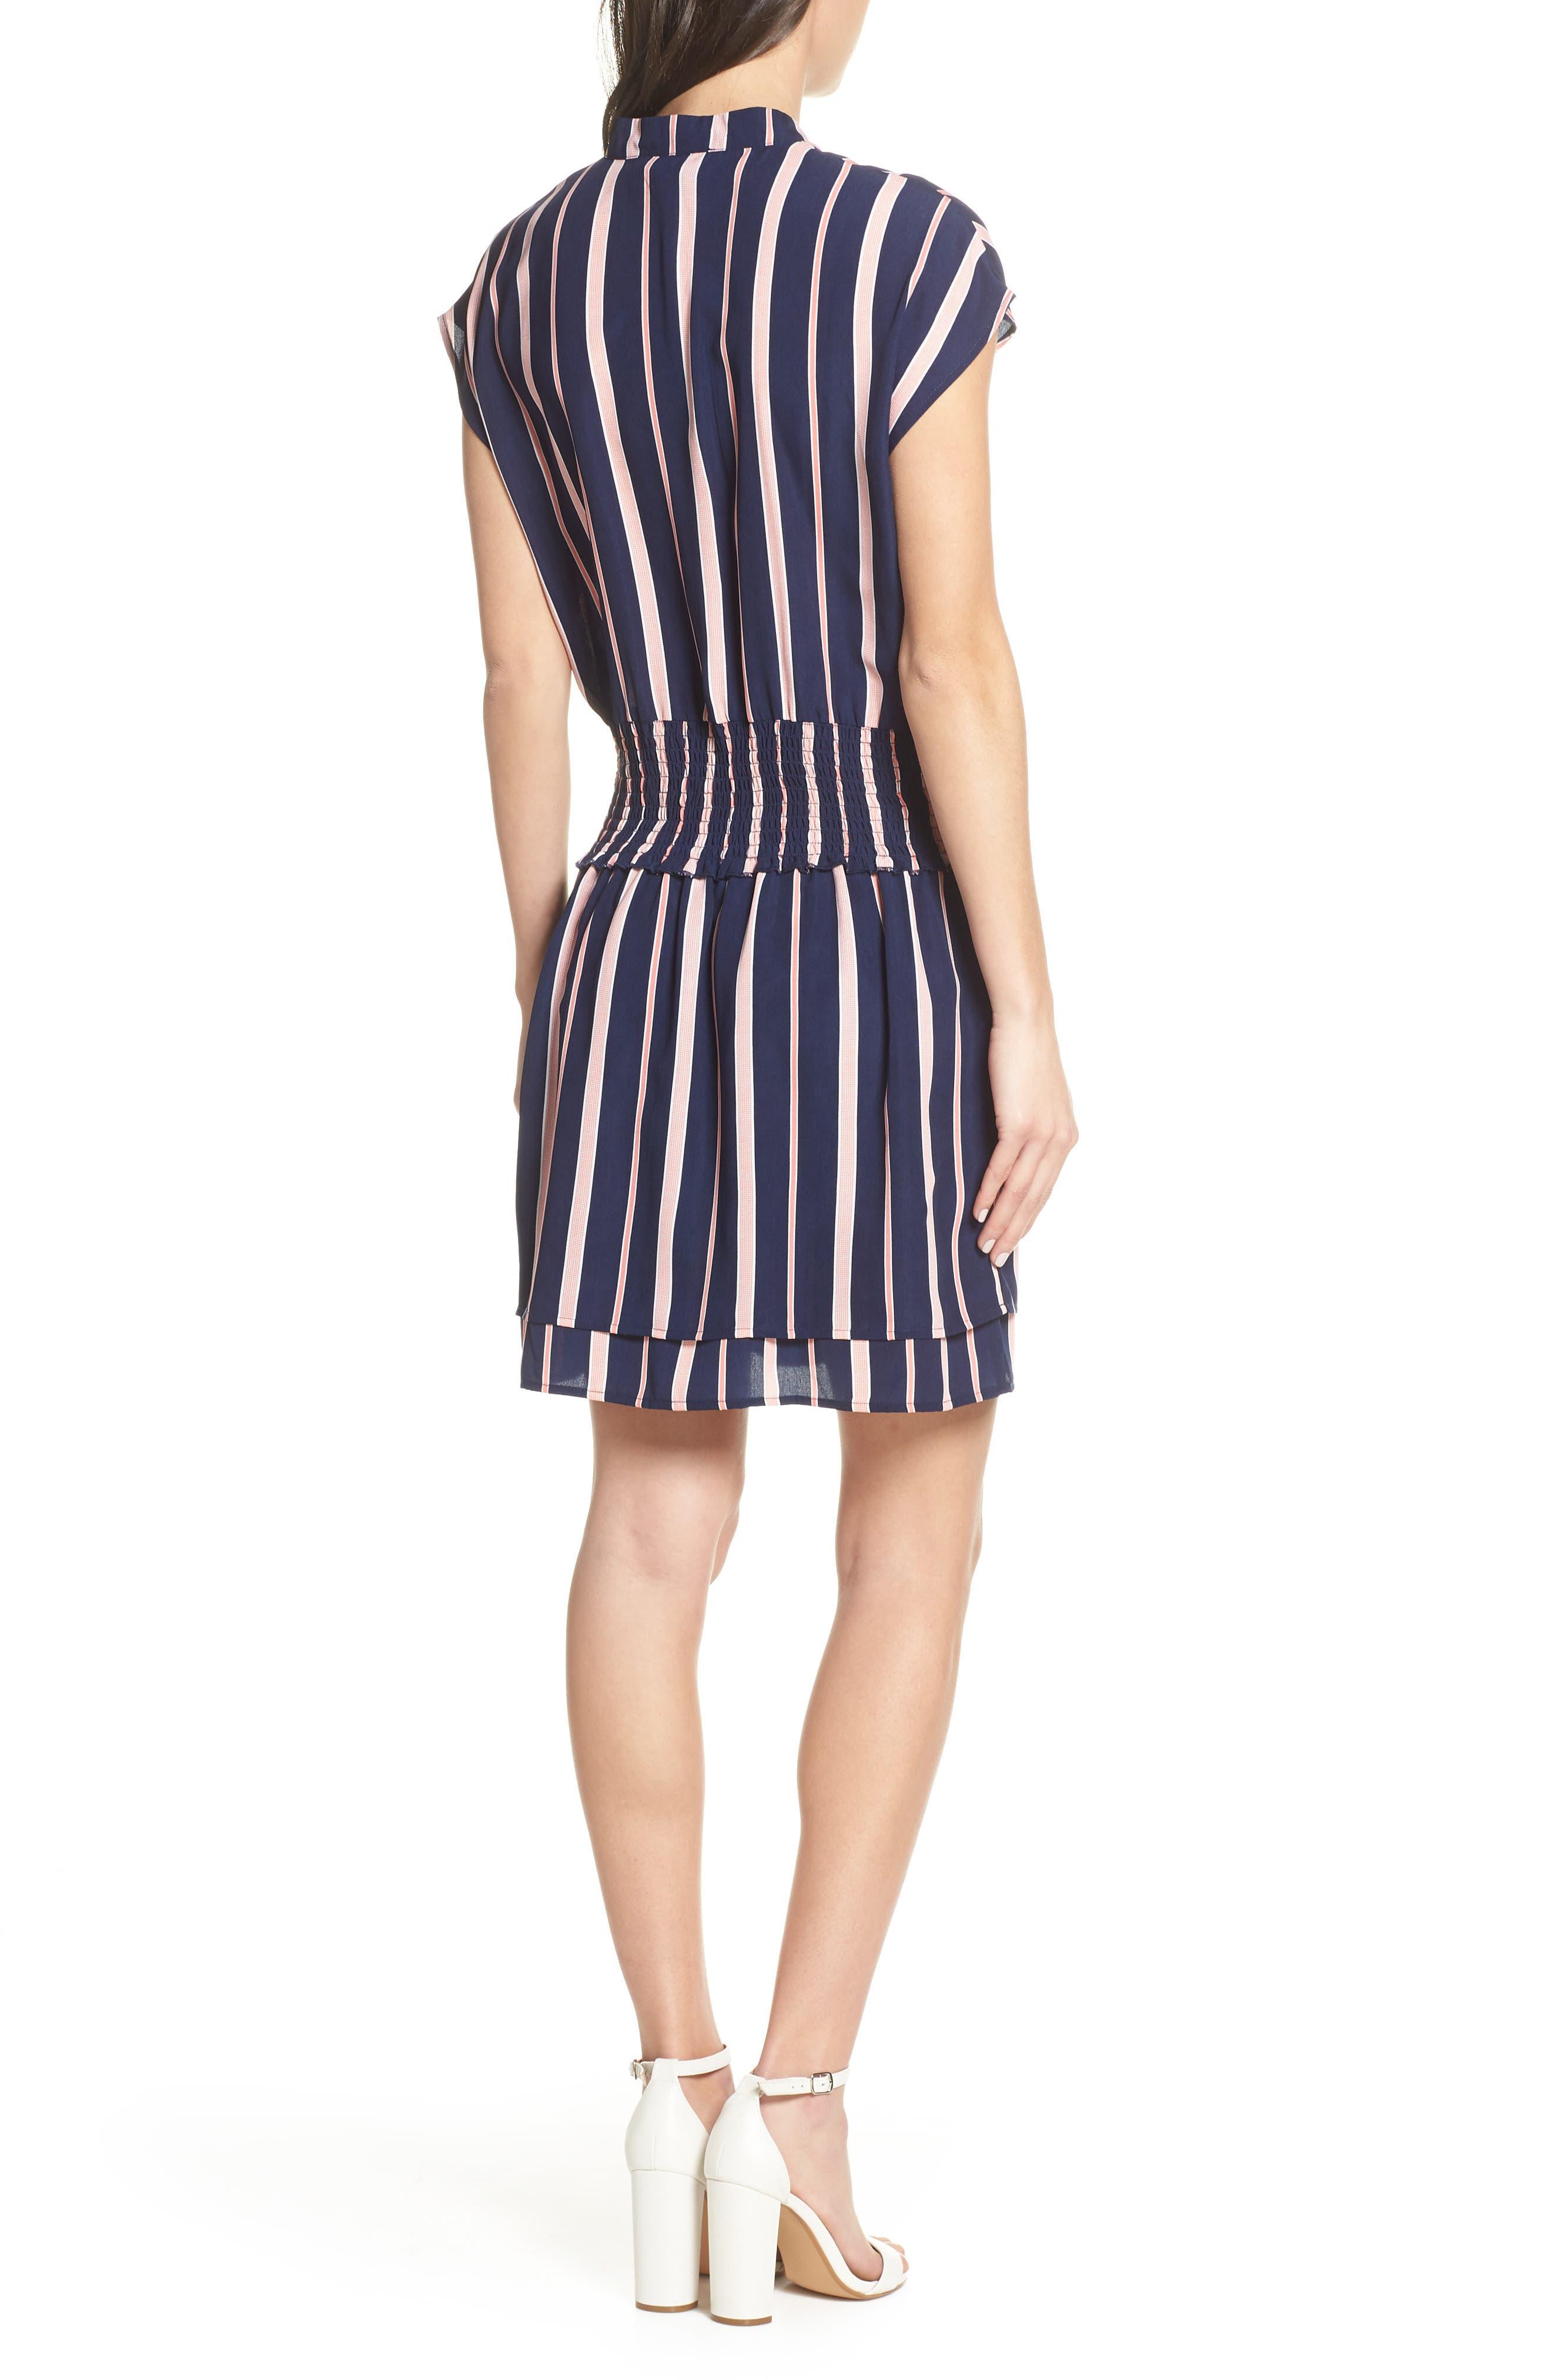 CHARLES HENRY, Smocked Stripe Dress, Alternate thumbnail 2, color, NAVY/ PINK STRIPE